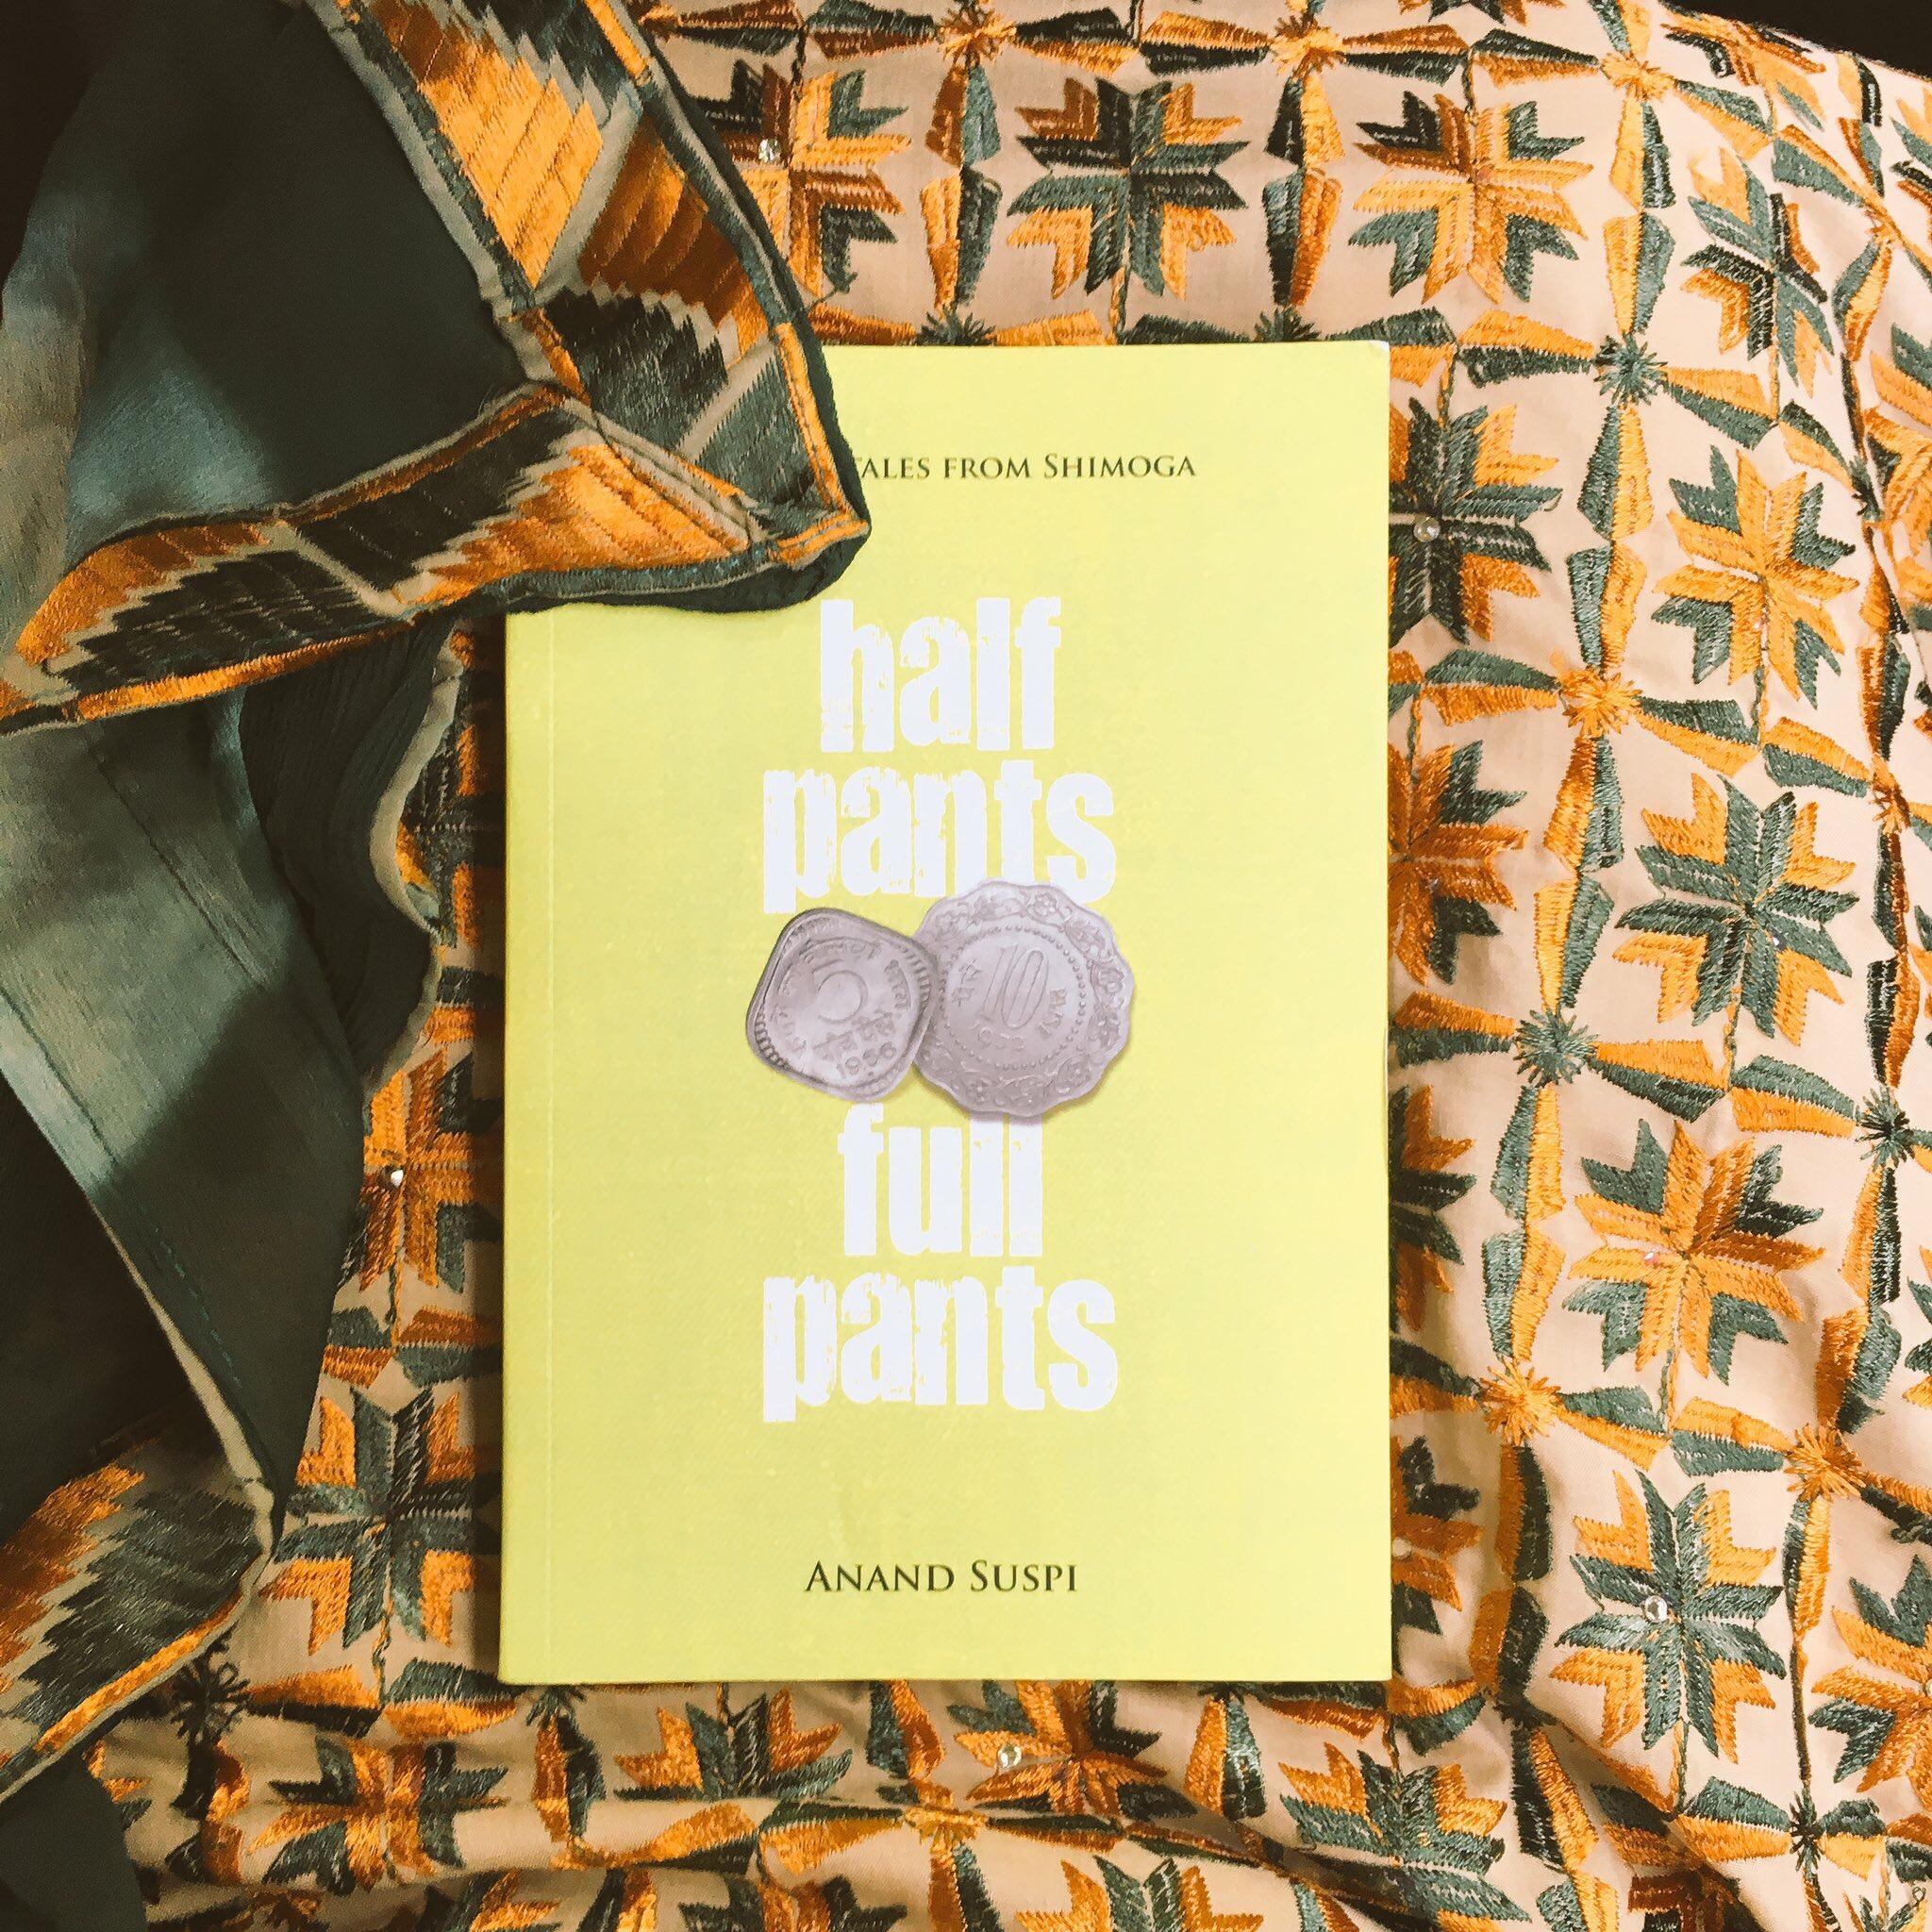 Half Pants Full Pants: #BookReview and #Giveaway